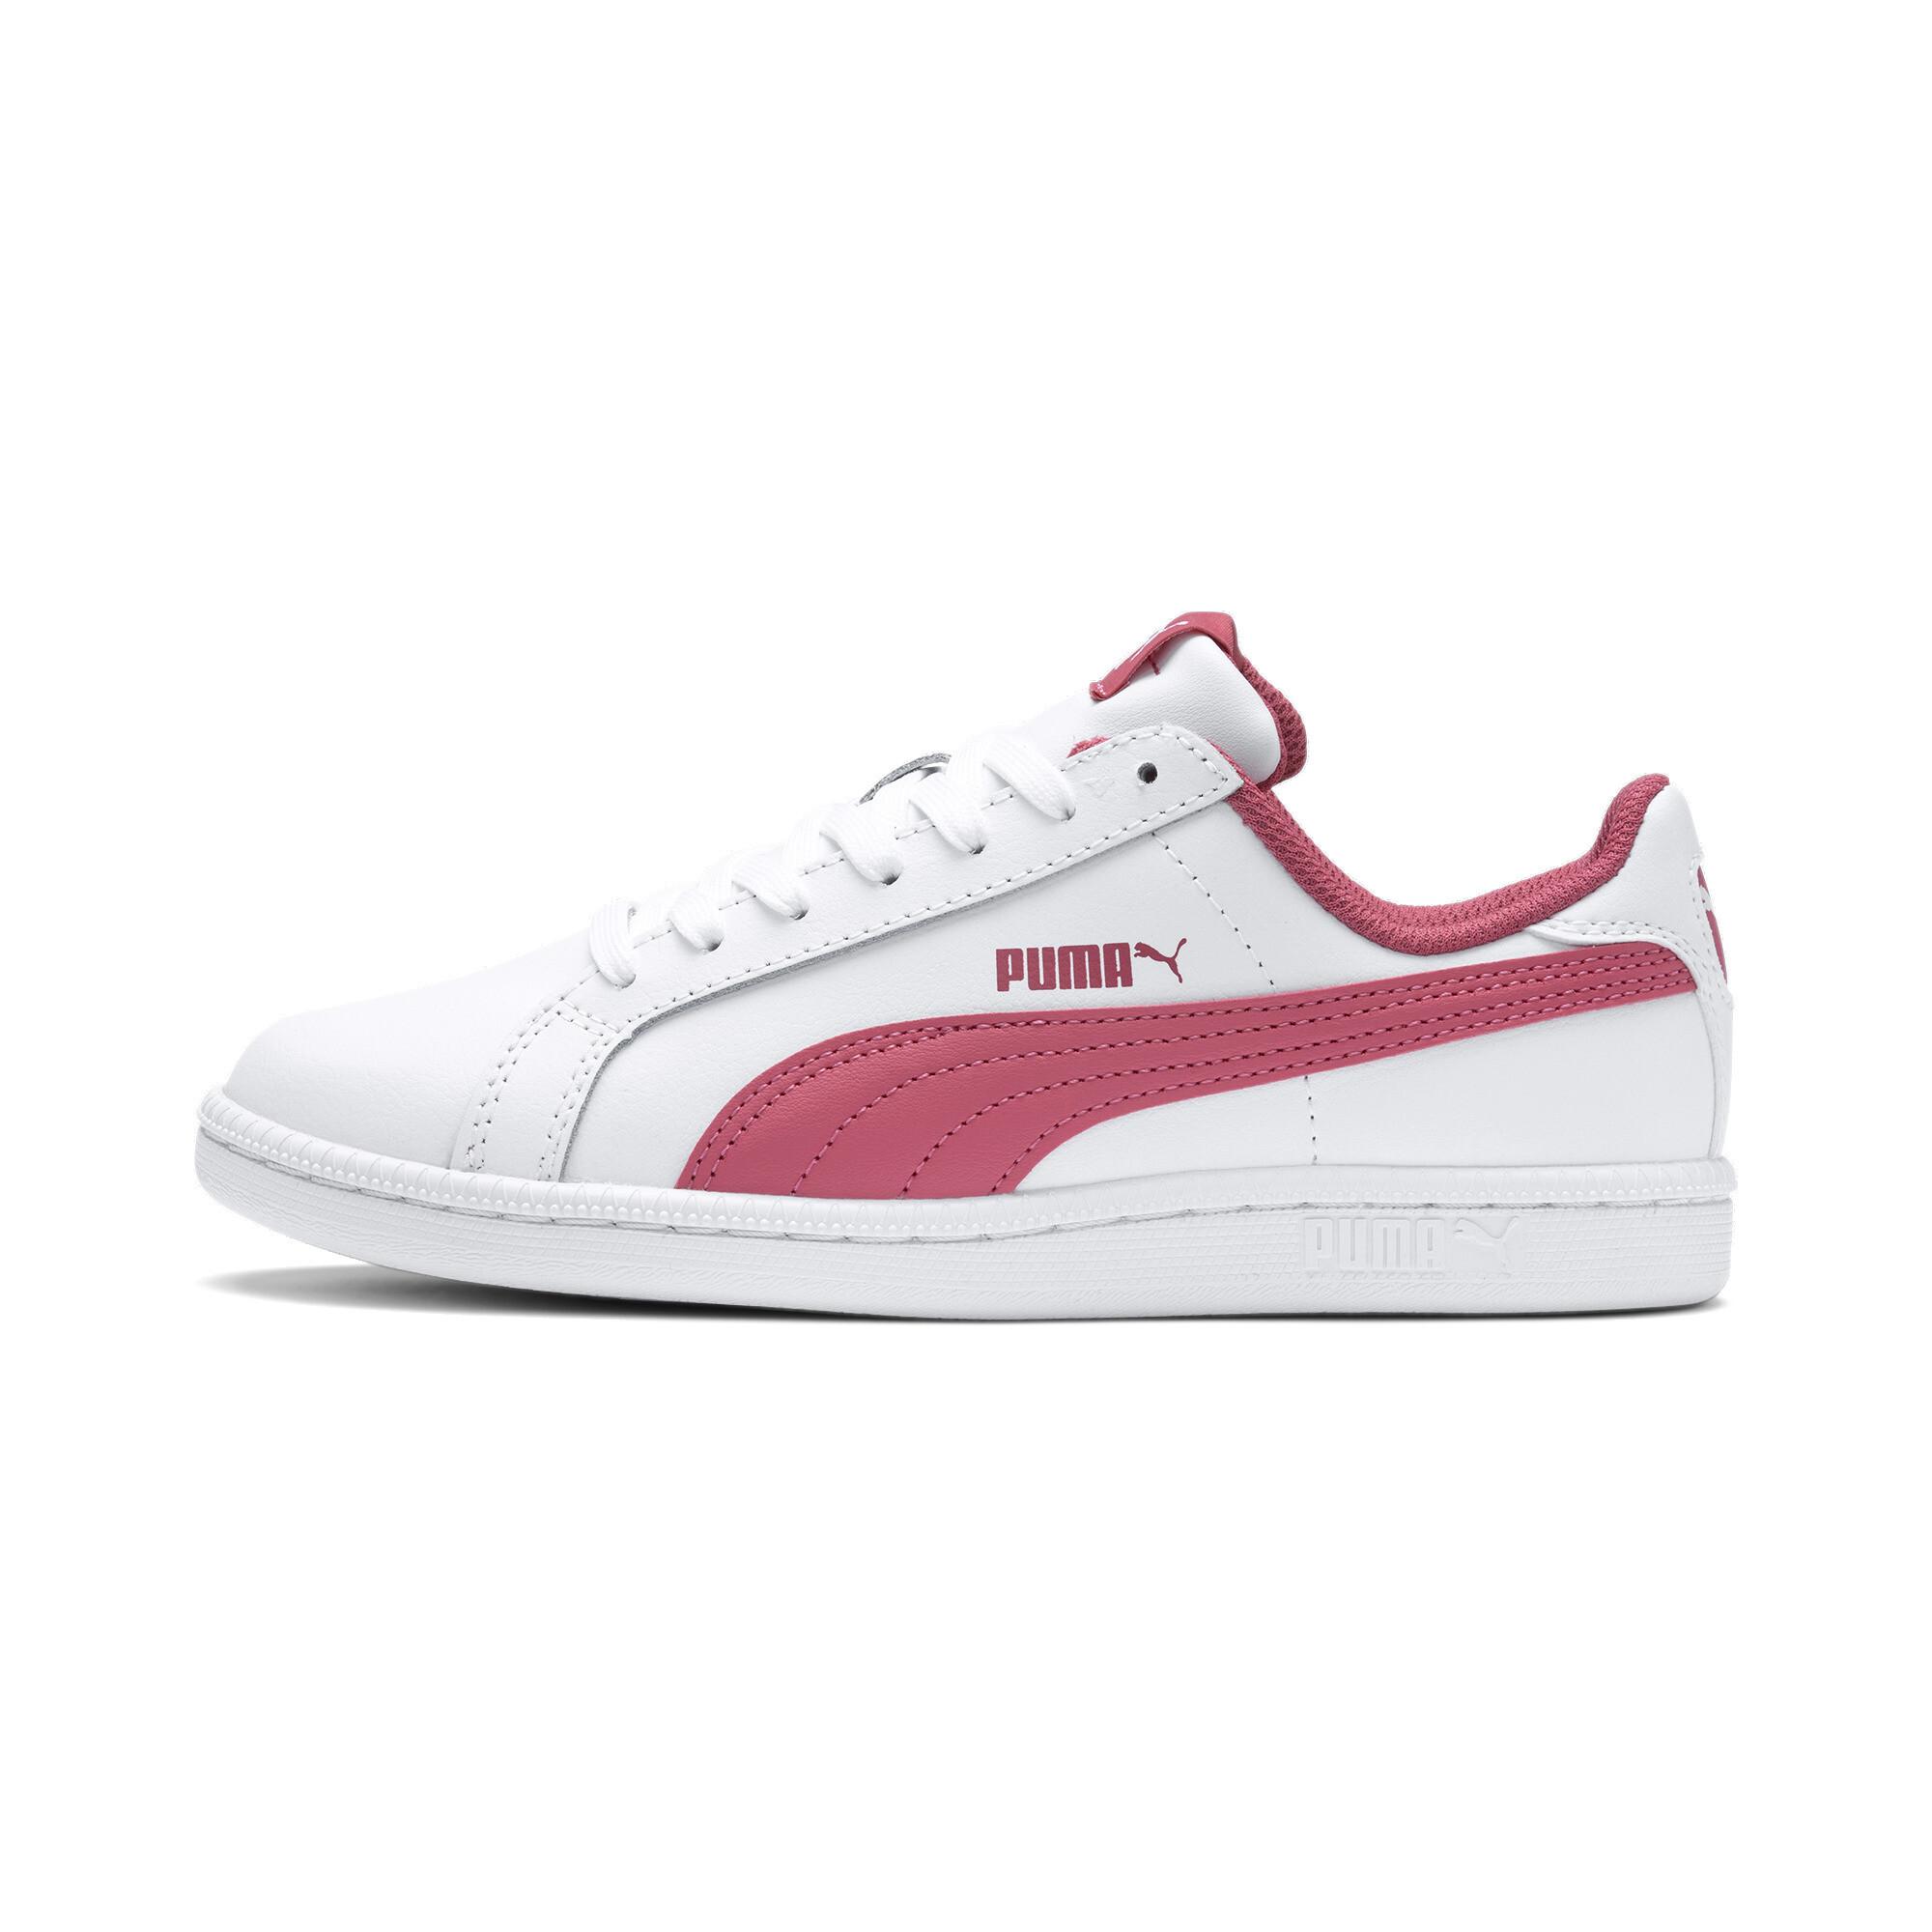 PUMA-Smash-Jr-Sneaker-Unisex-Schuhe-Kinder-Neu Indexbild 19